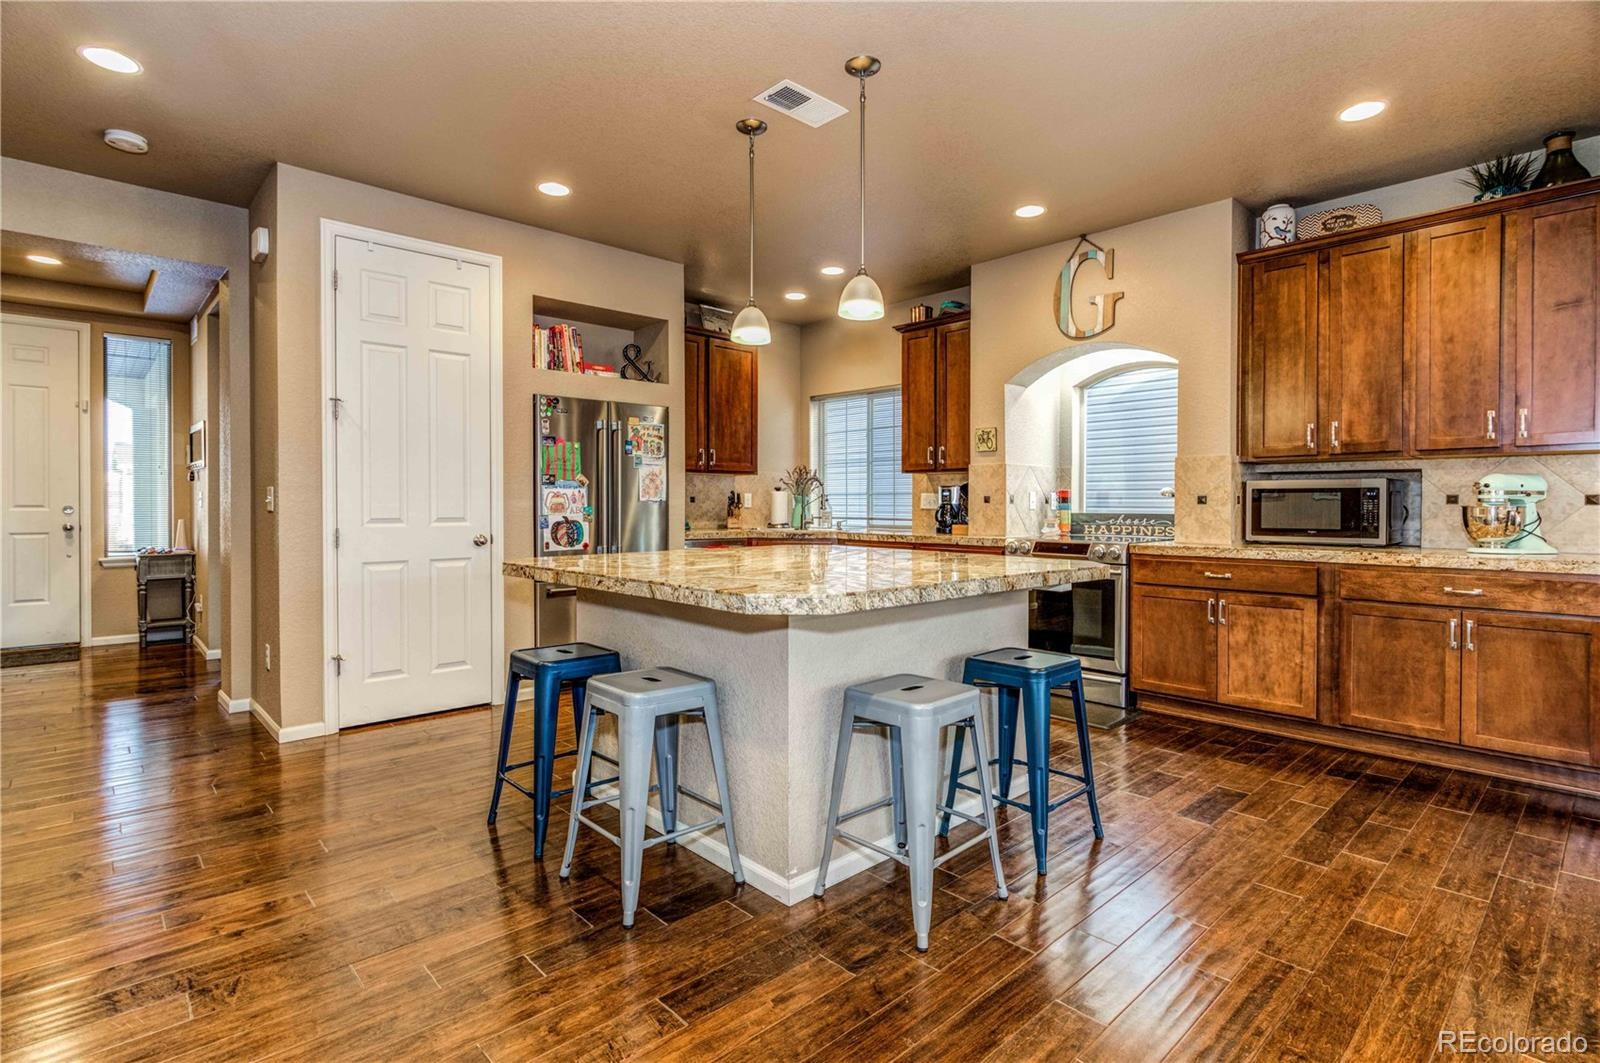 MLS# 4961371 - 3 - 7487 Mountain Spruce , Colorado Springs, CO 80927